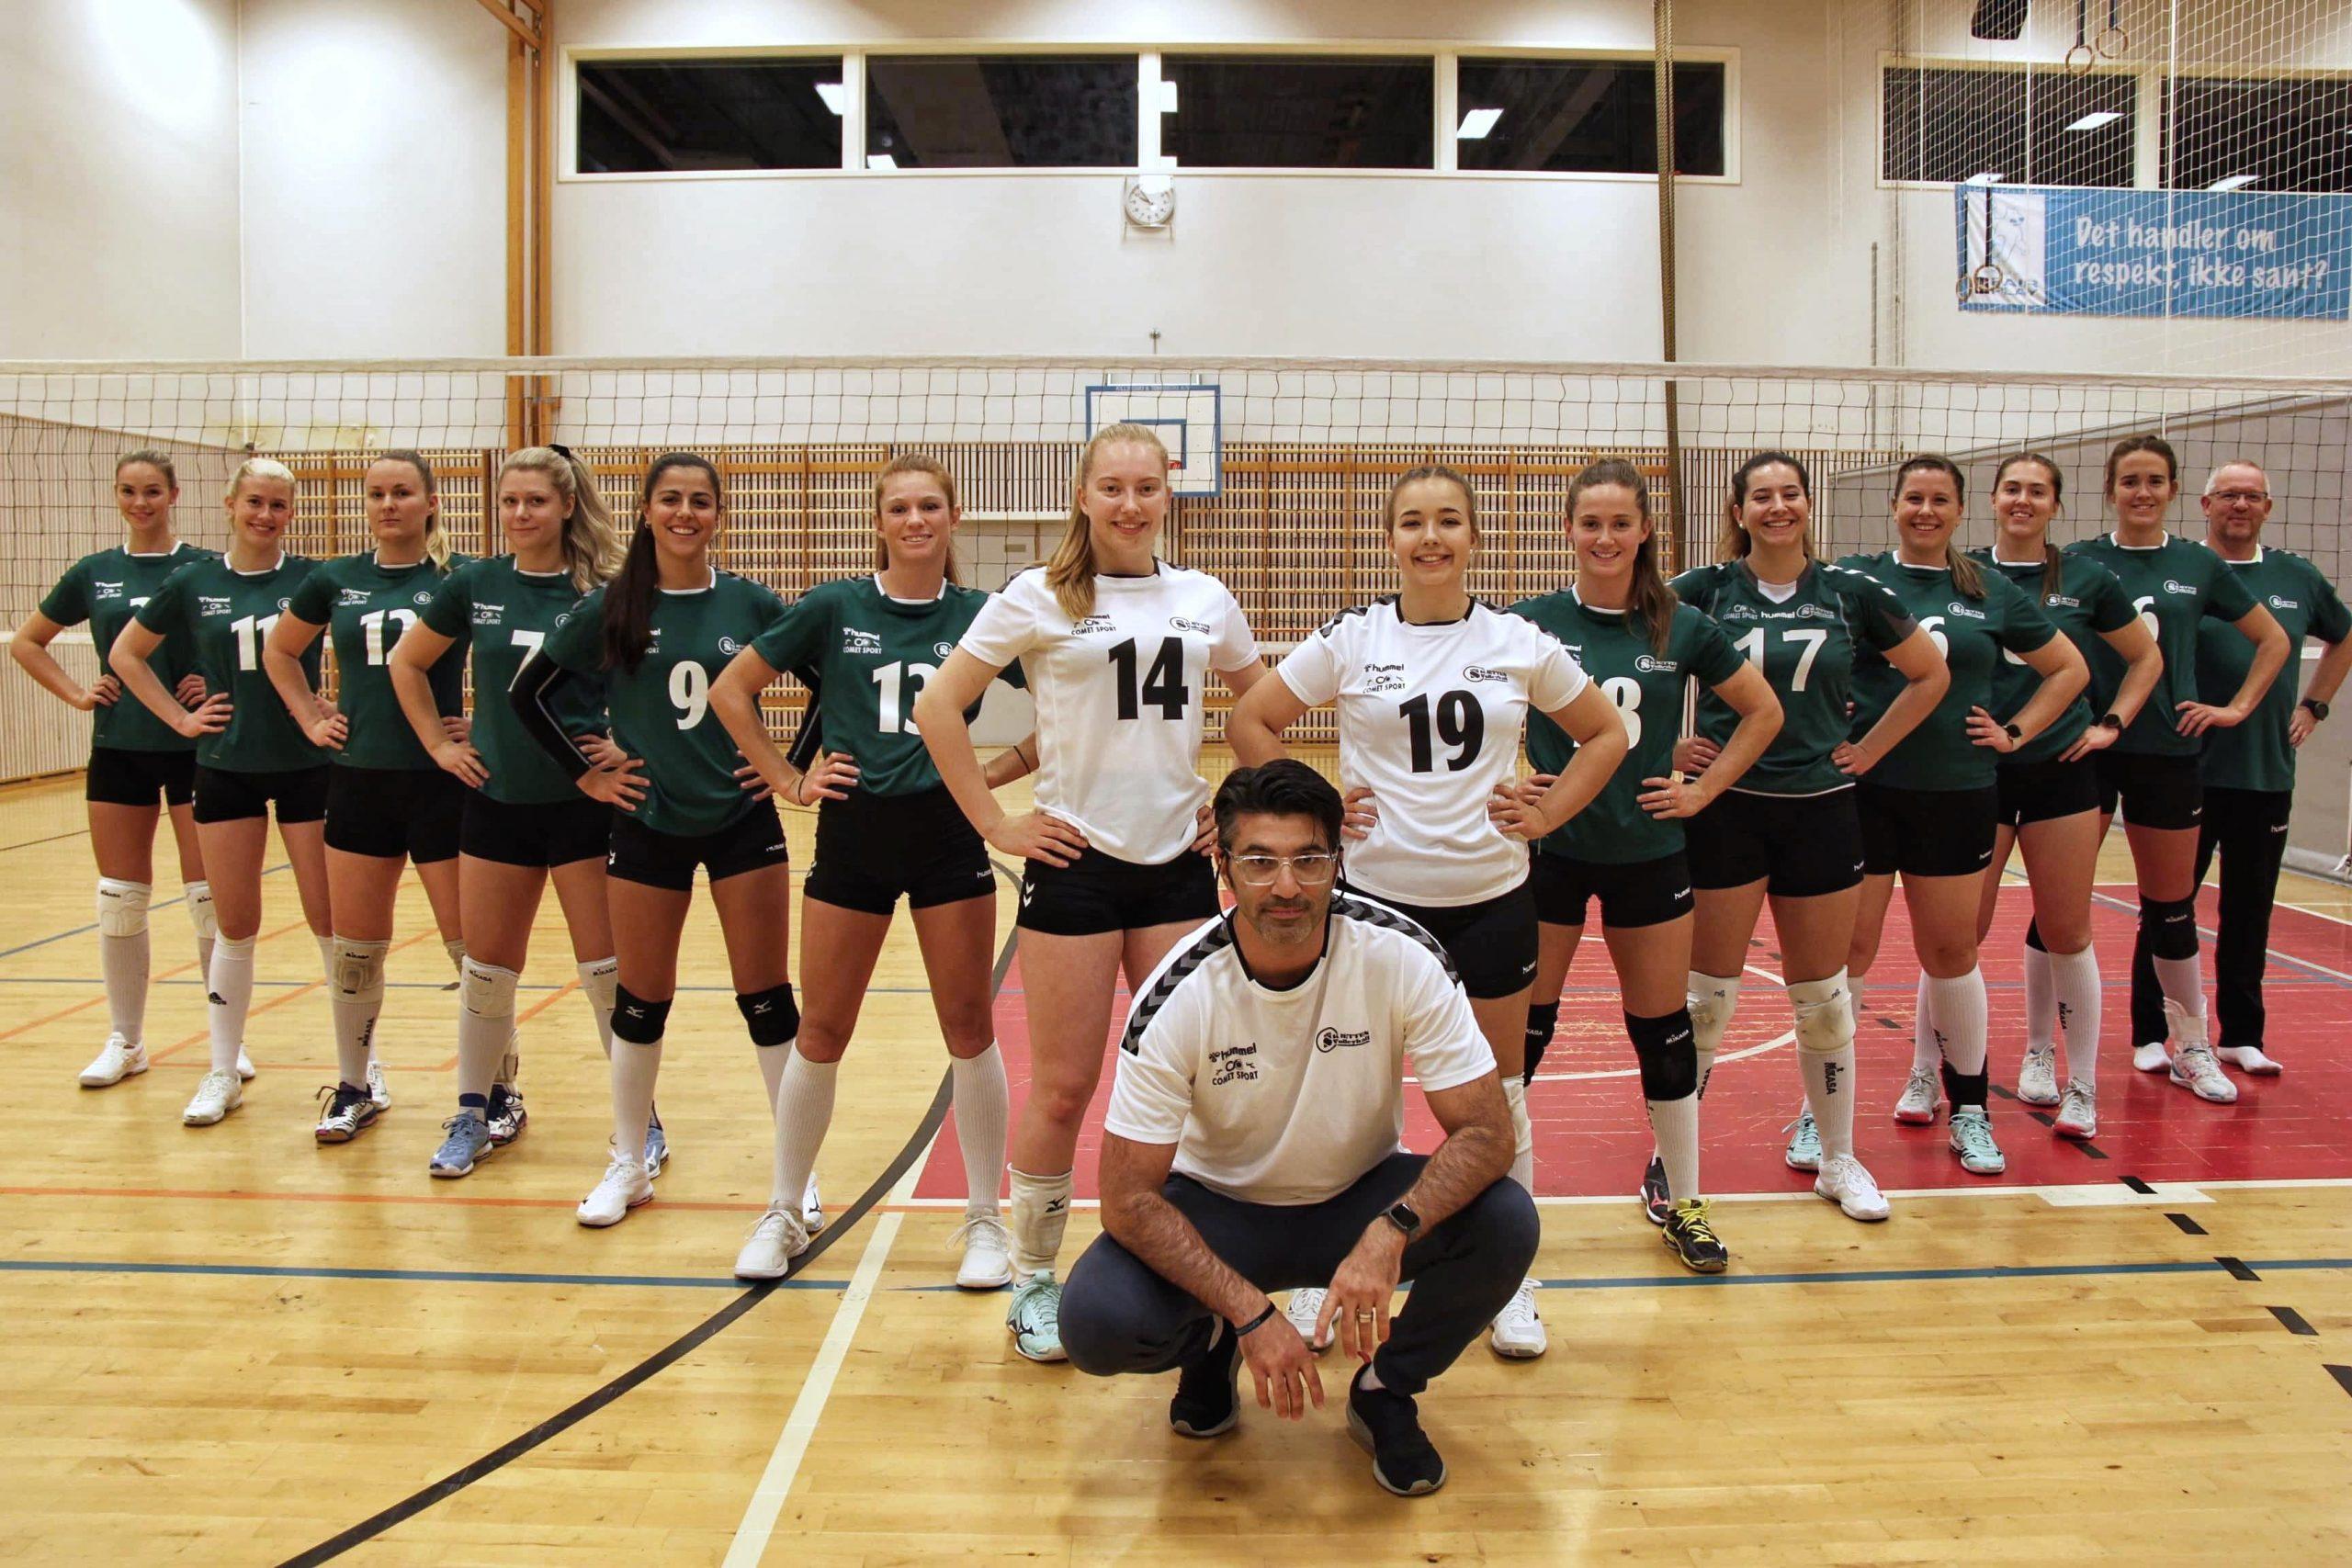 Volleyballspillere står oppstilt til lagbilde foran volleyballnett.